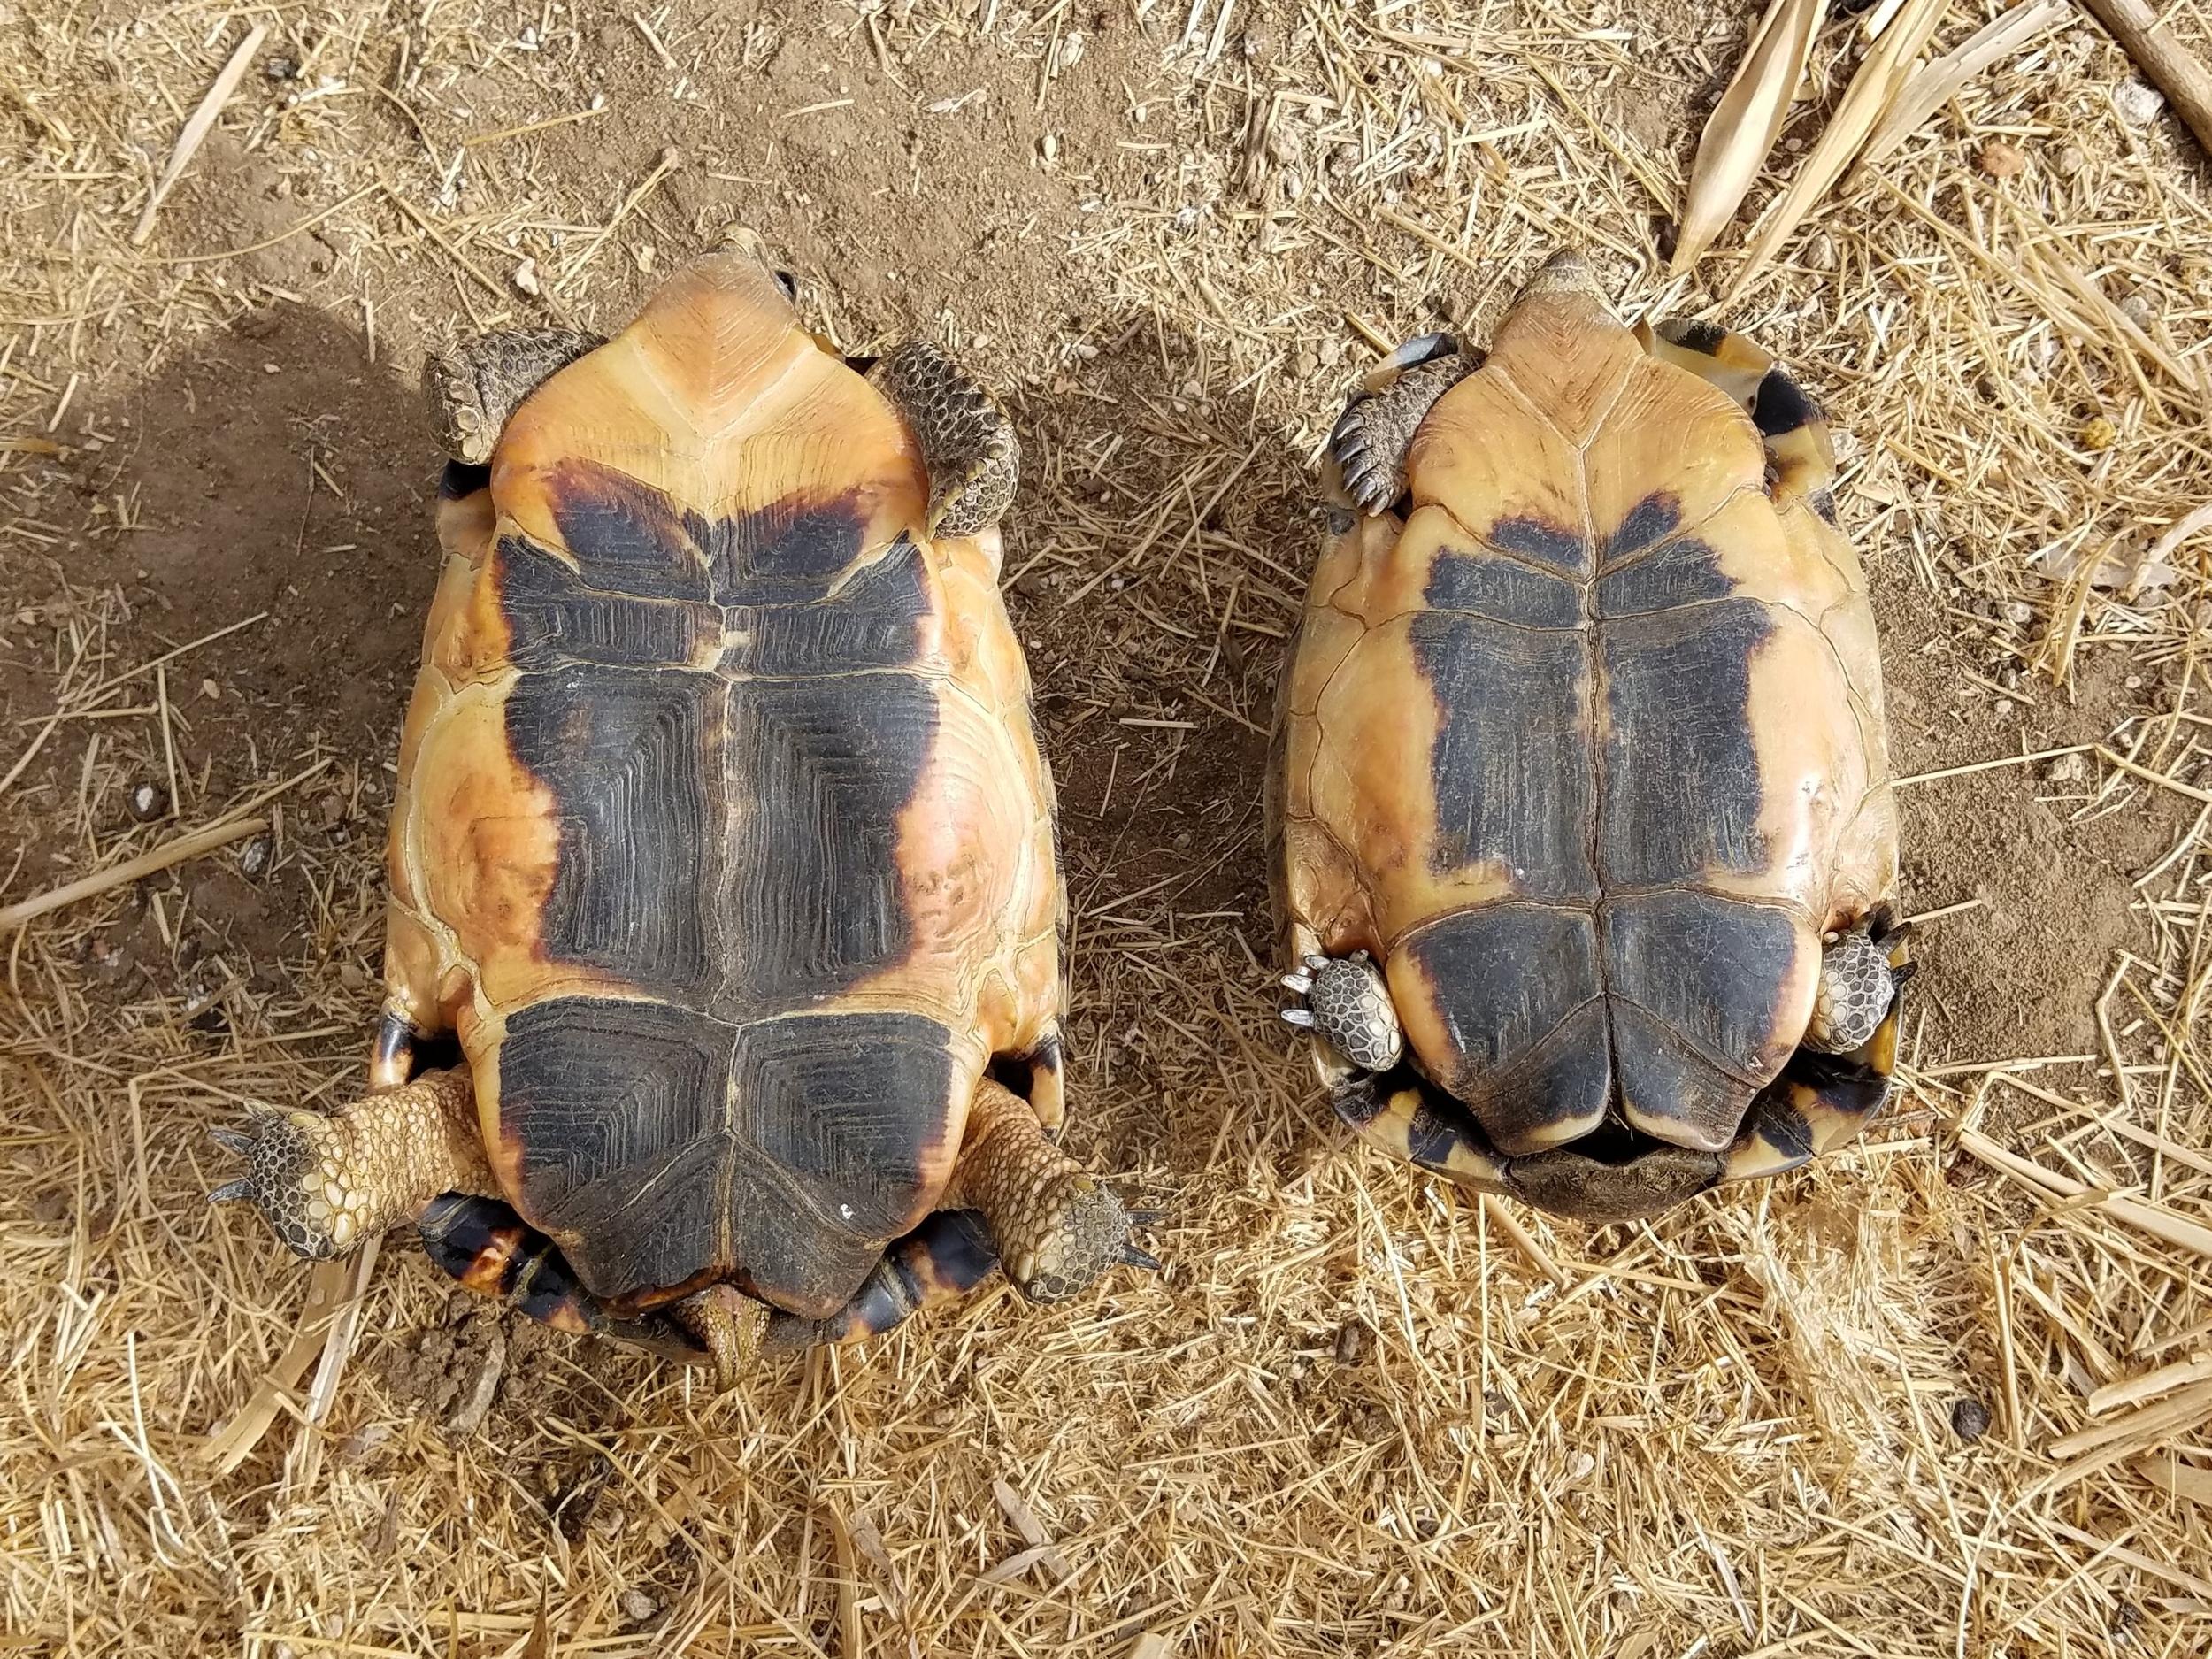 Photo by Steven Barker - Two adult Female Bowsprit Tortoises